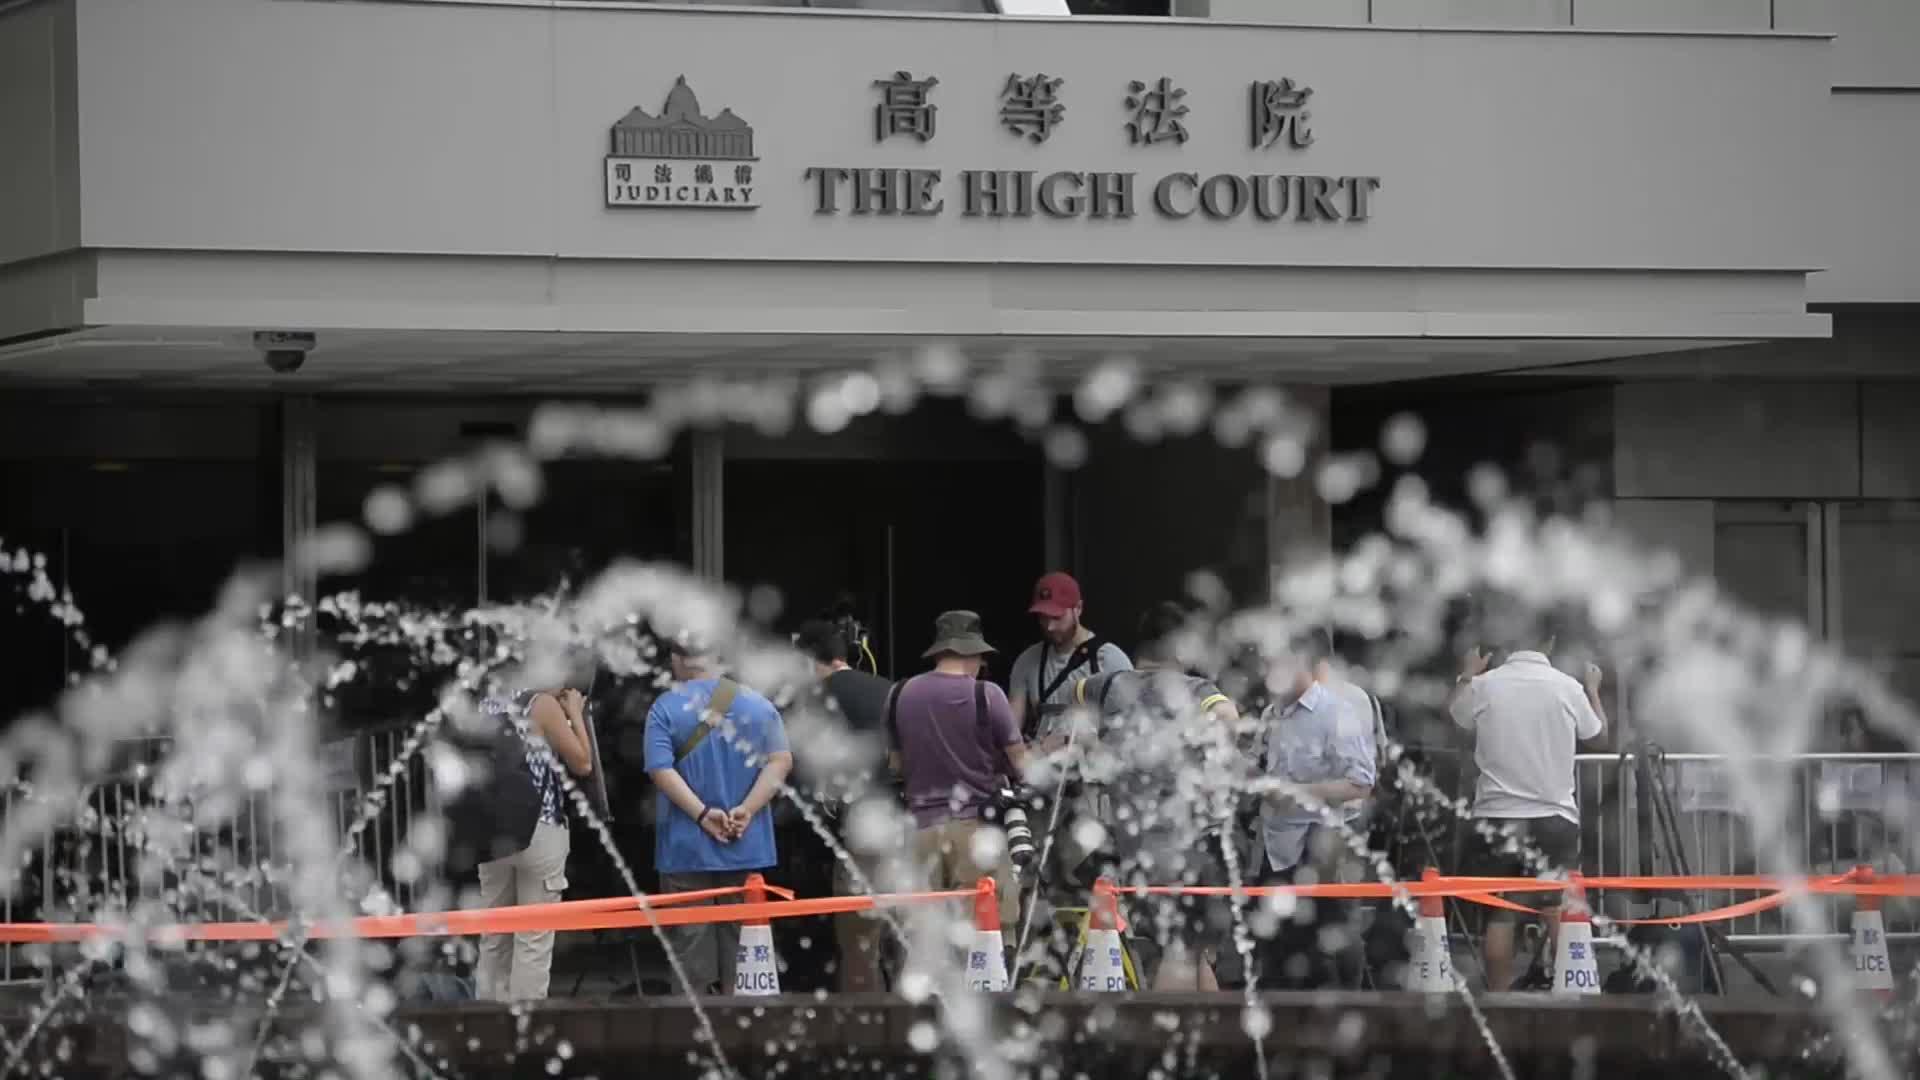 Hong Kong Joshua Wong Appeal Verdict on Occupy Mong Kok Case